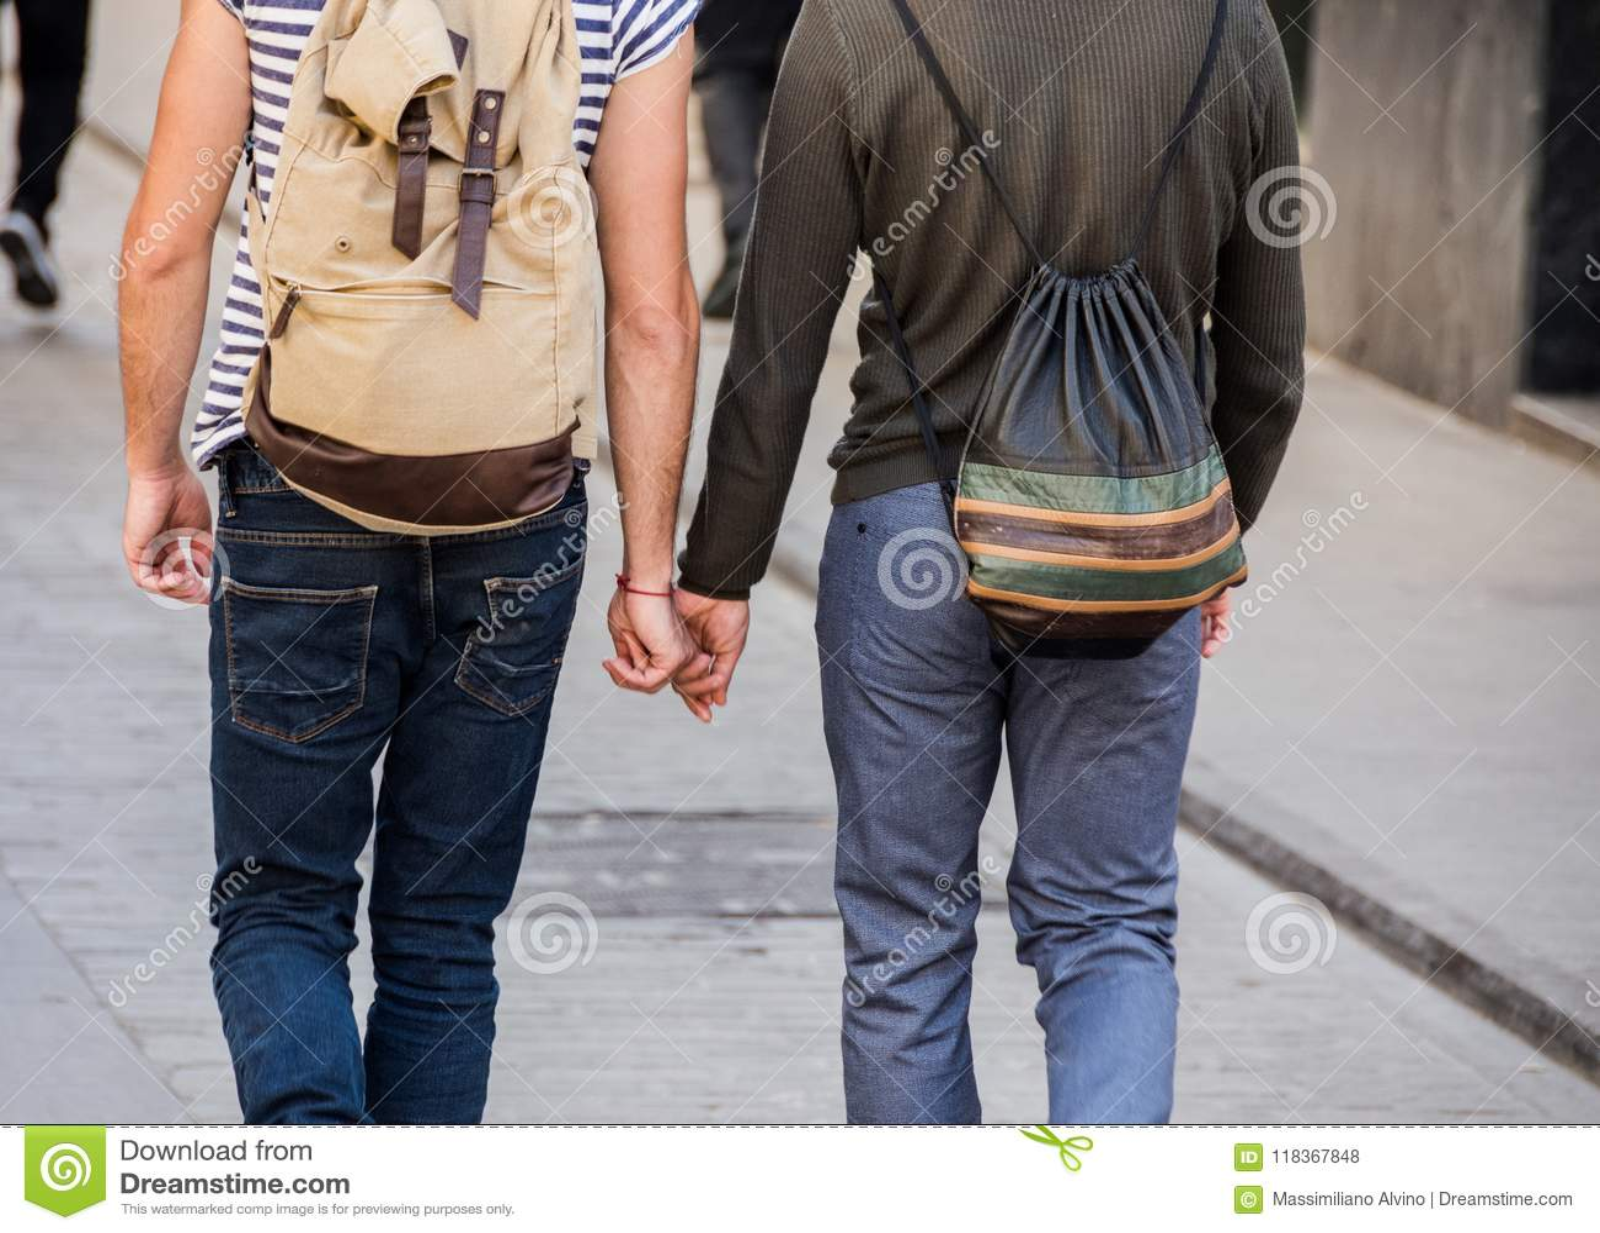 Homosexual walking down the street